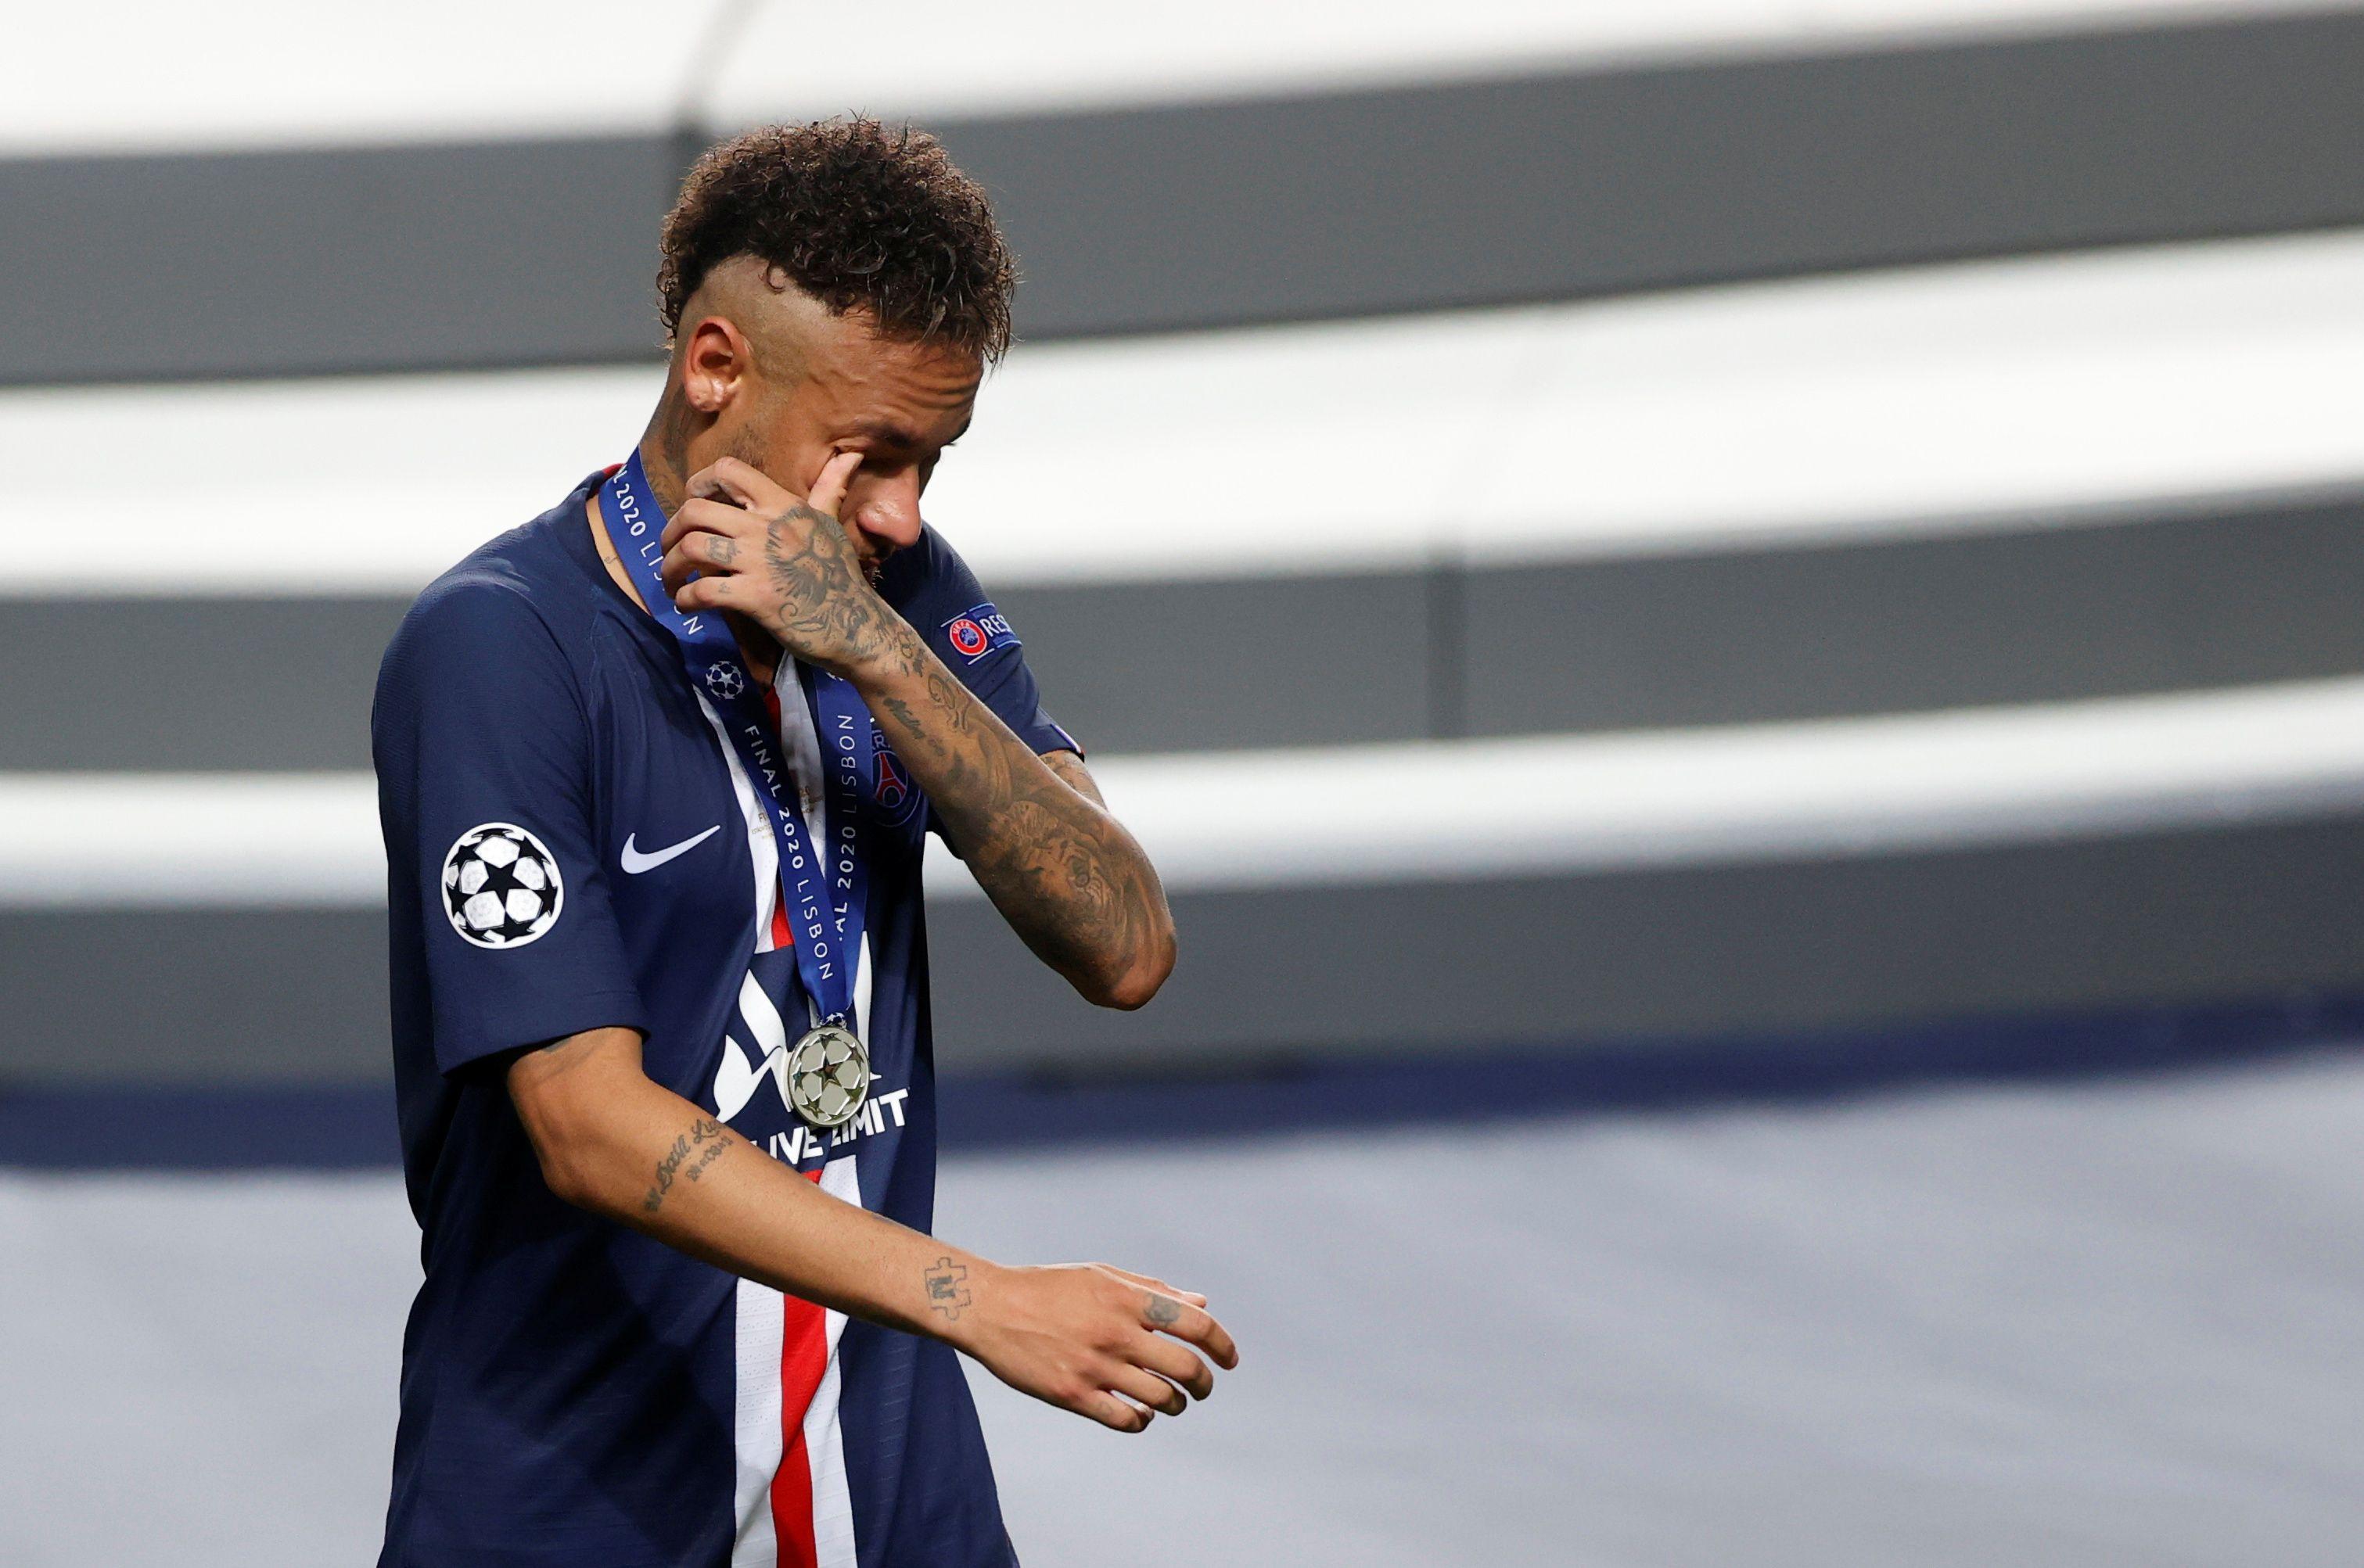 El dolor de Neymar tras caer en la final de la Champions League (REUTERS/Matthew Childs/Pool)